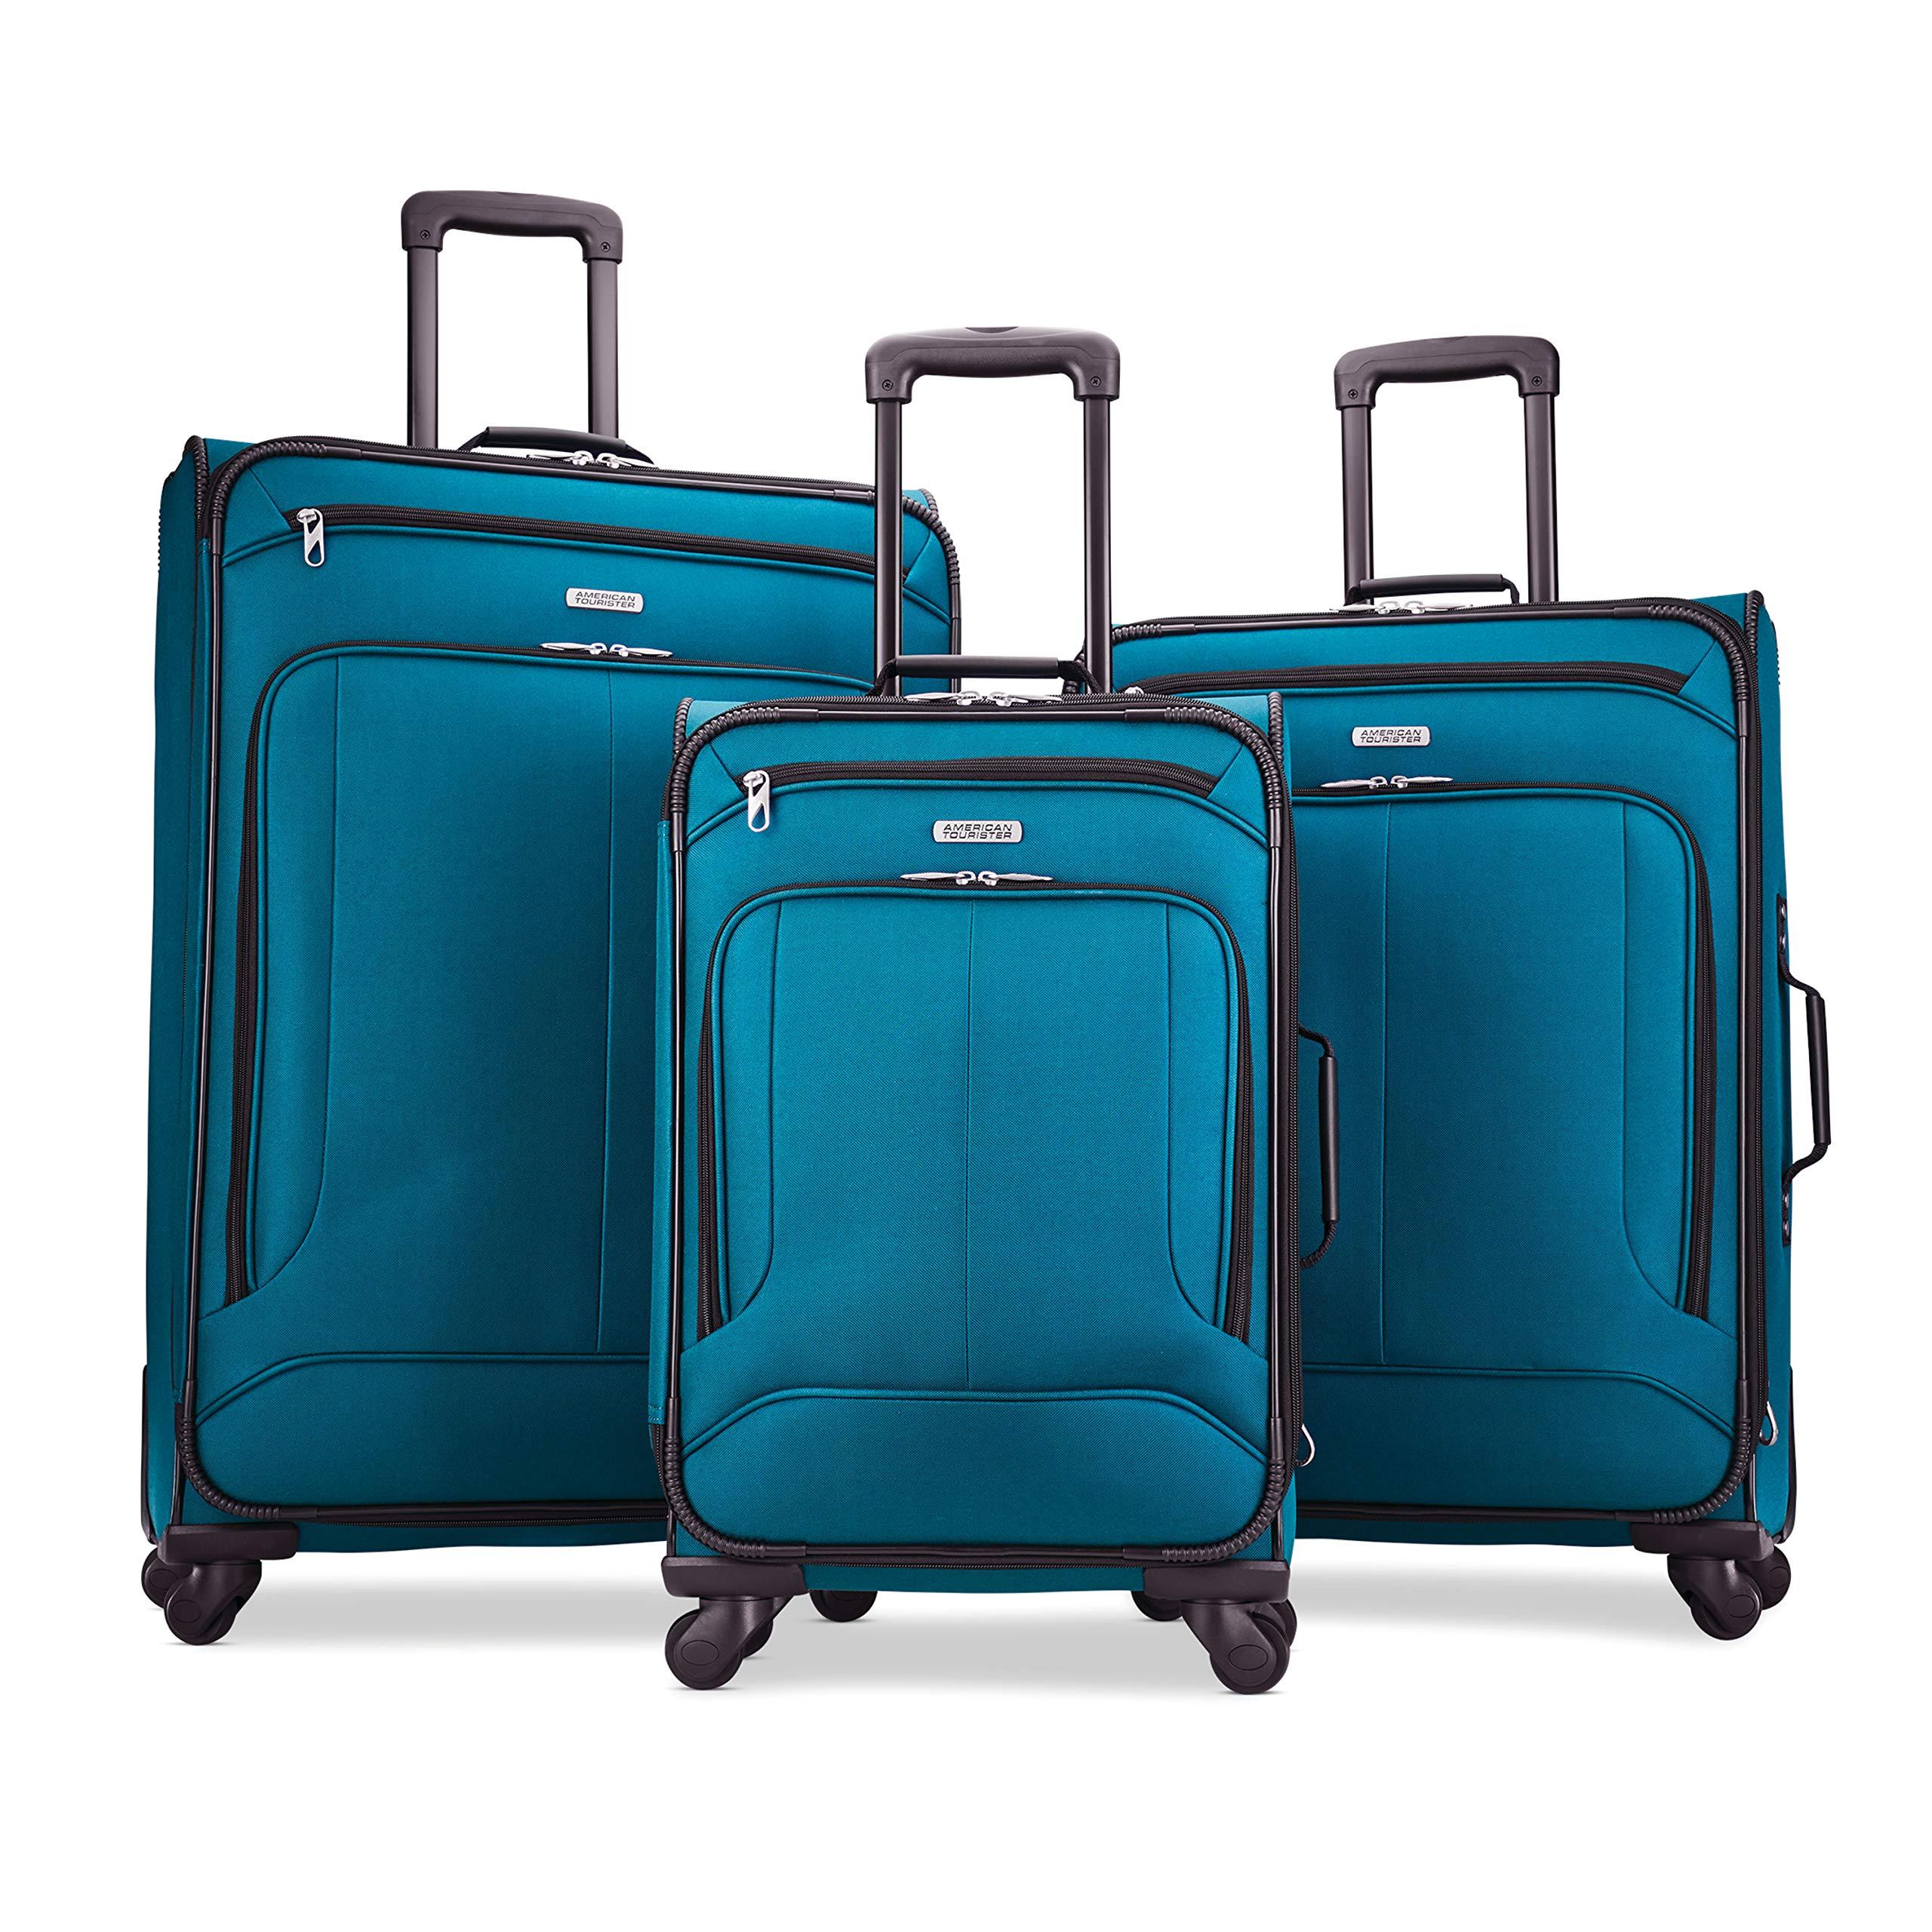 American Tourister 3 Piece Softside Luggage